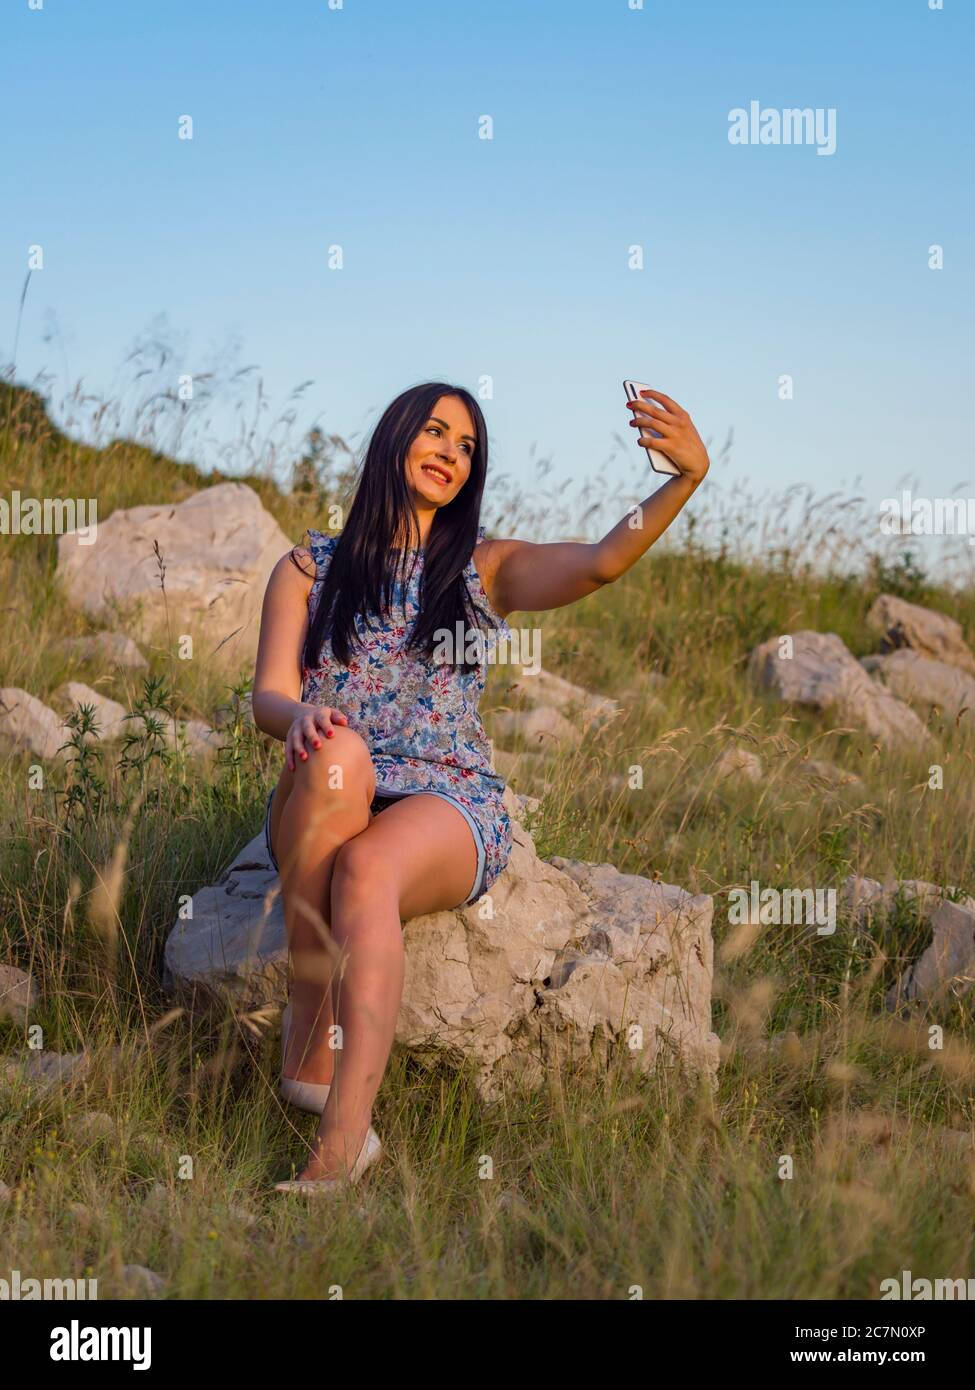 Selfie in nature using hand holding smartphone teengirl is sitting on rock in natural environment legs high heels highheels slight smile optimistic Stock Photo